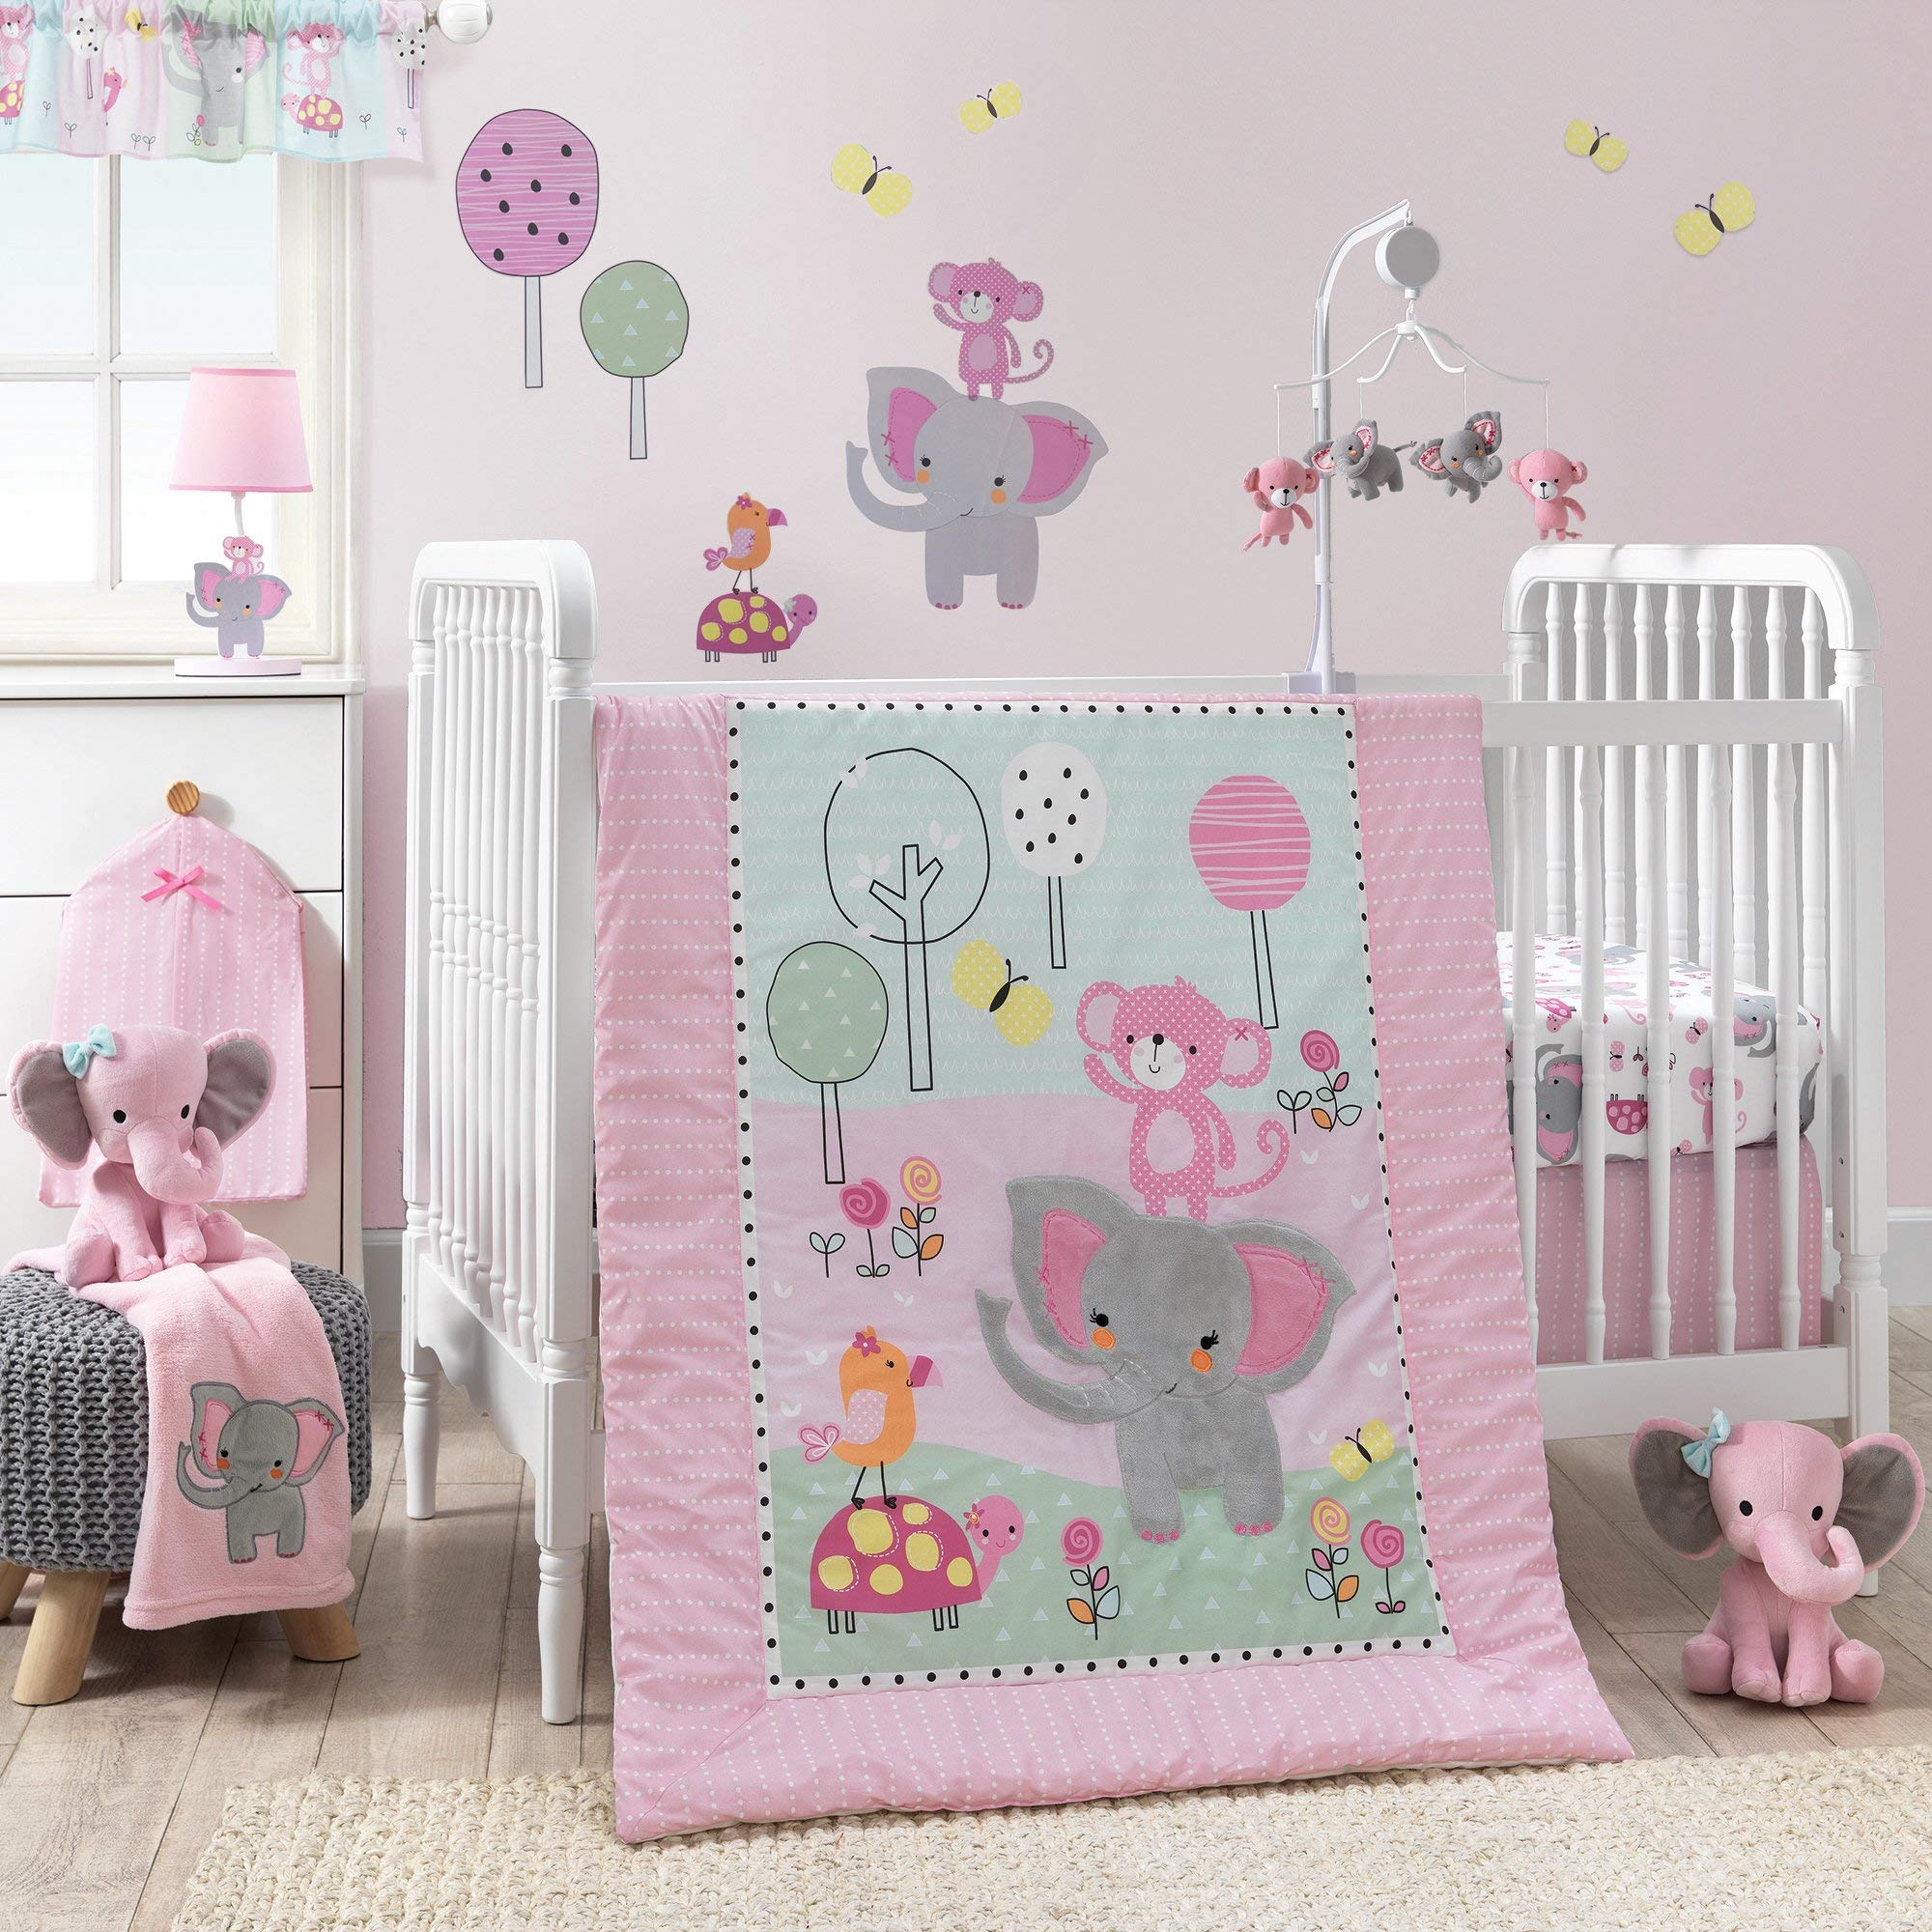 Bedtime Originals Twinkle Toes Jungle Elephant 3 Piece Bedding Set, Pink/White by Bedtime Originals